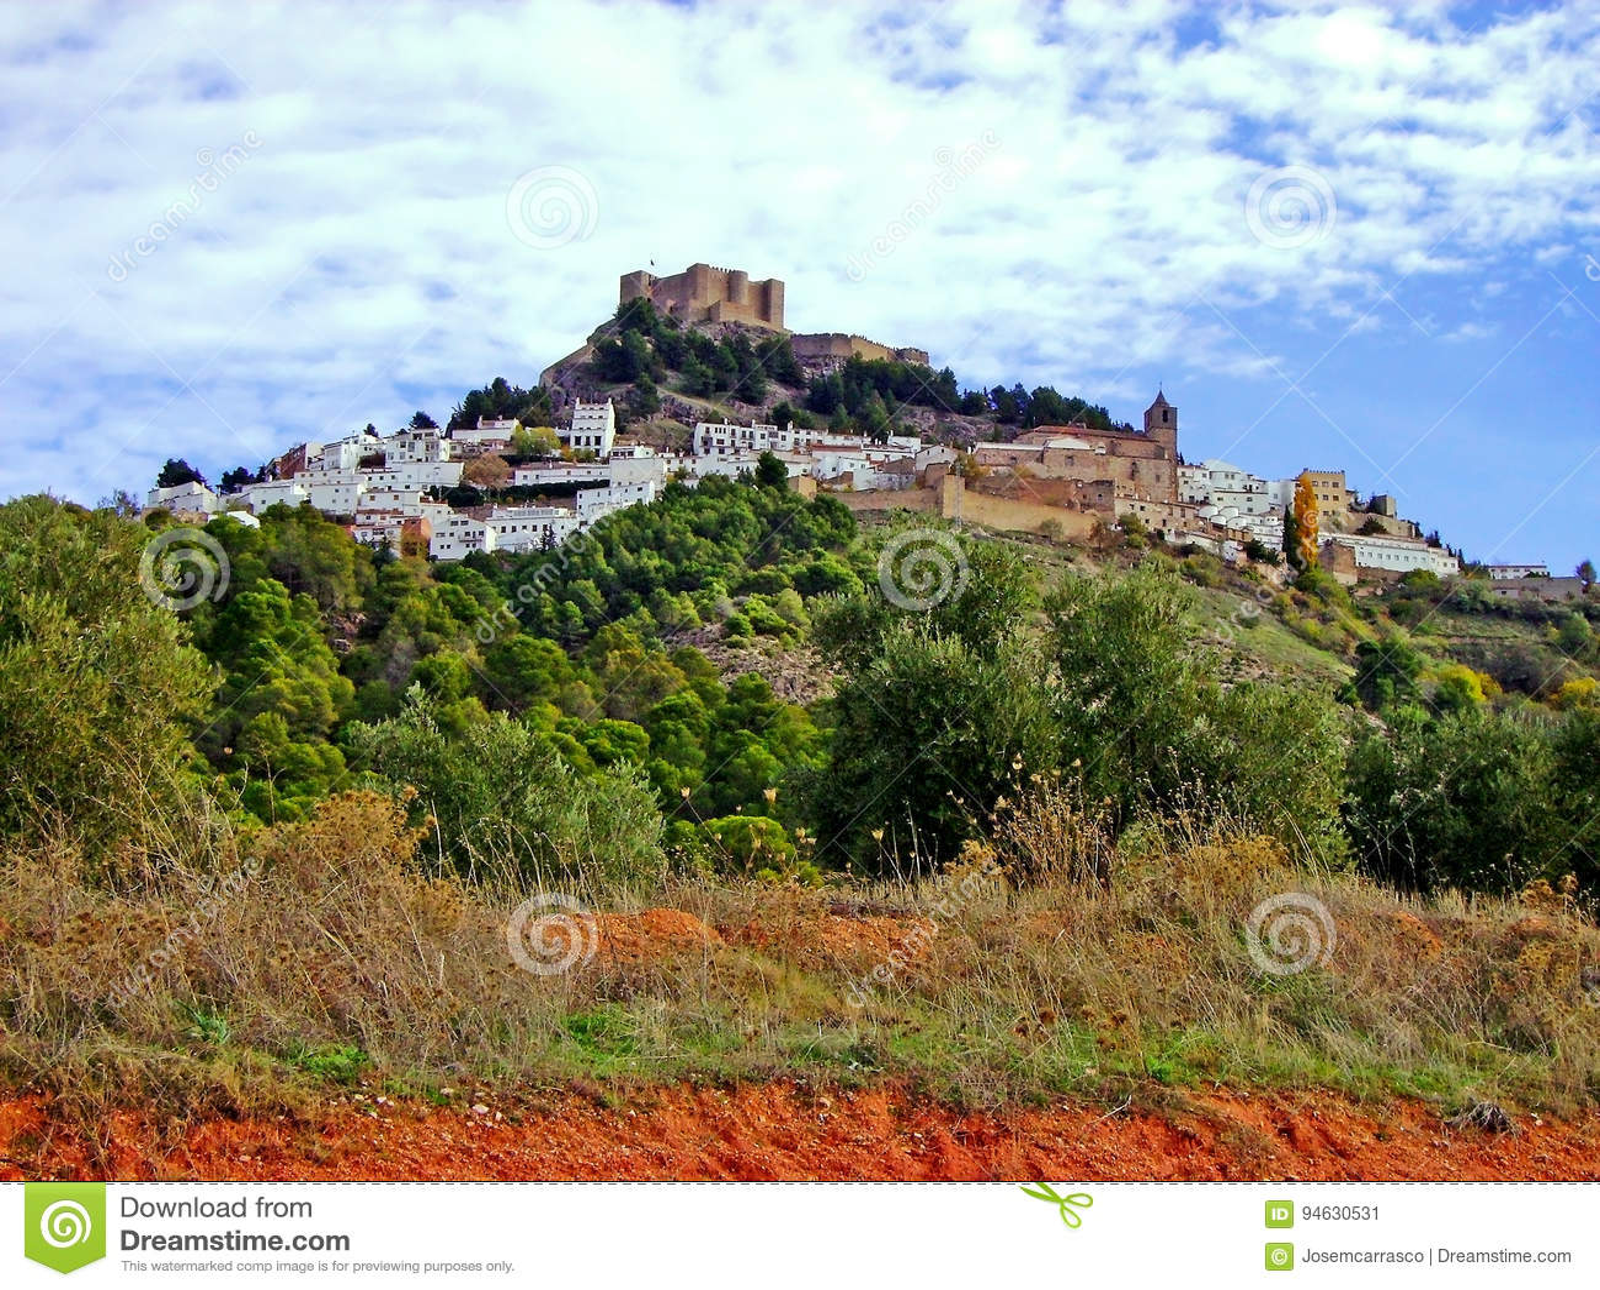 Villaggio Segura de la Sierra, Jaen andalusia spain